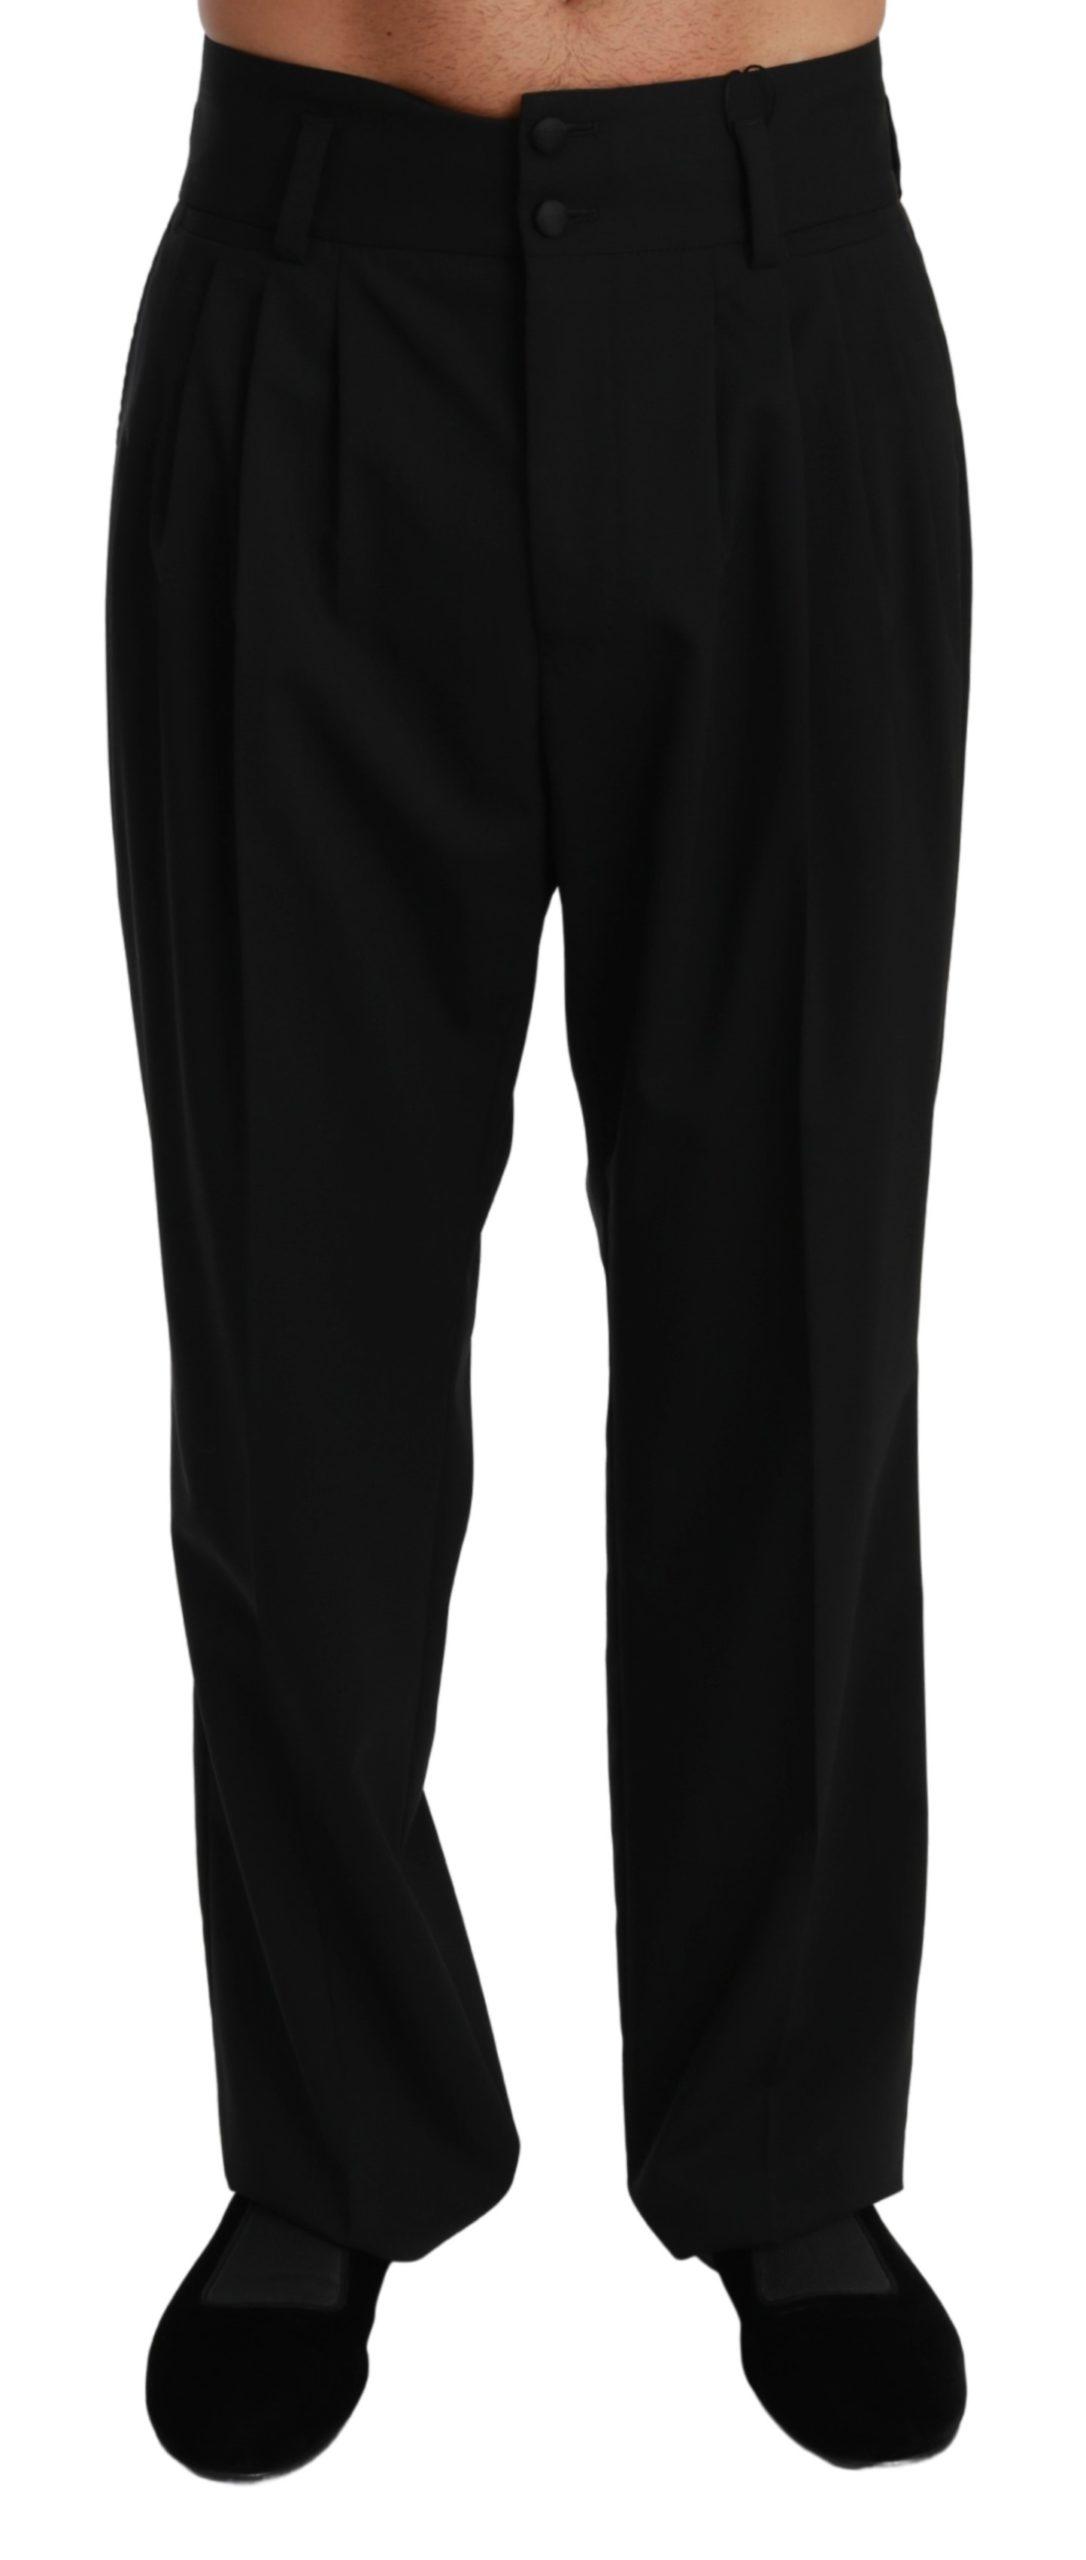 Dolce & Gabbana Men's Formal Dress Wool Trouser Black PAN71014 - IT48 | M